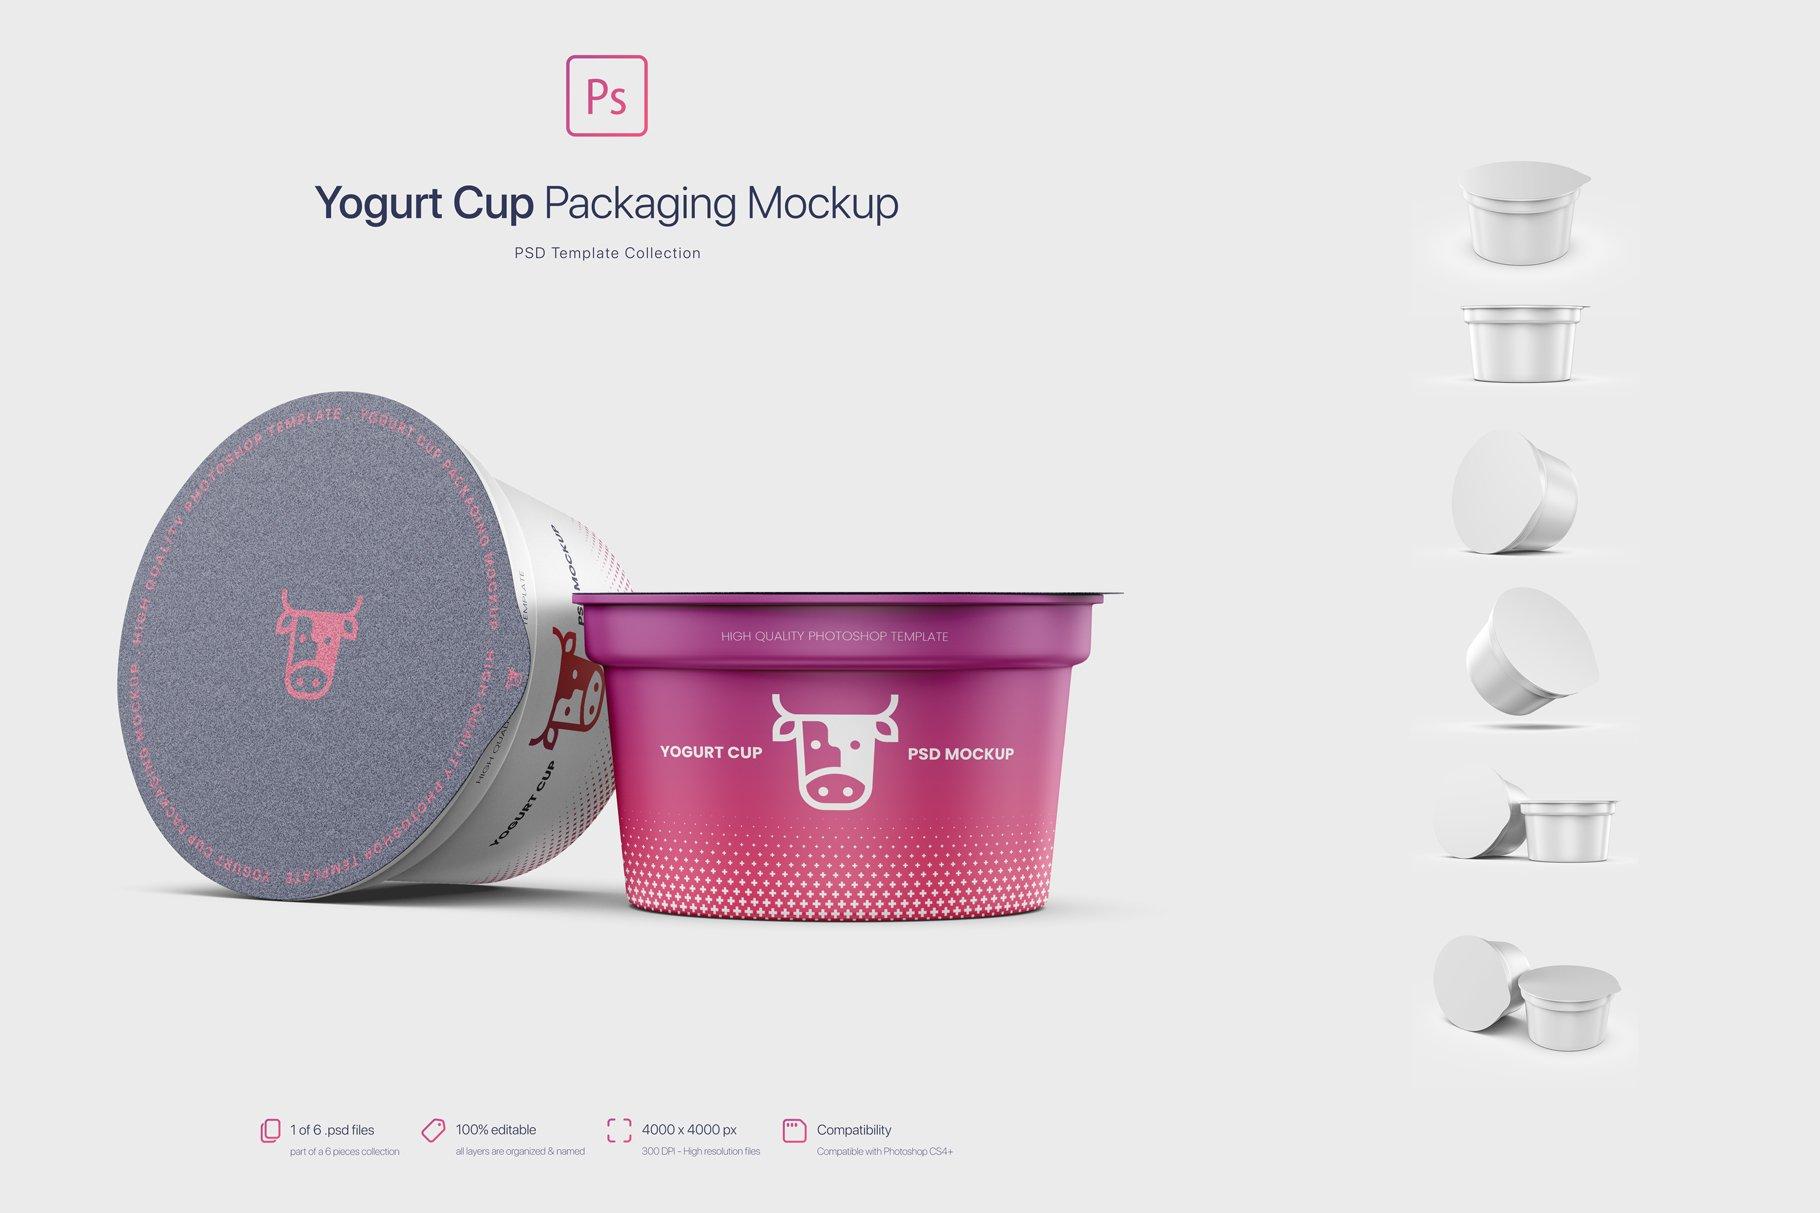 6款逼真高质量酸奶杯设计展示样机 Yogurt Cup Packaging Mockup插图3